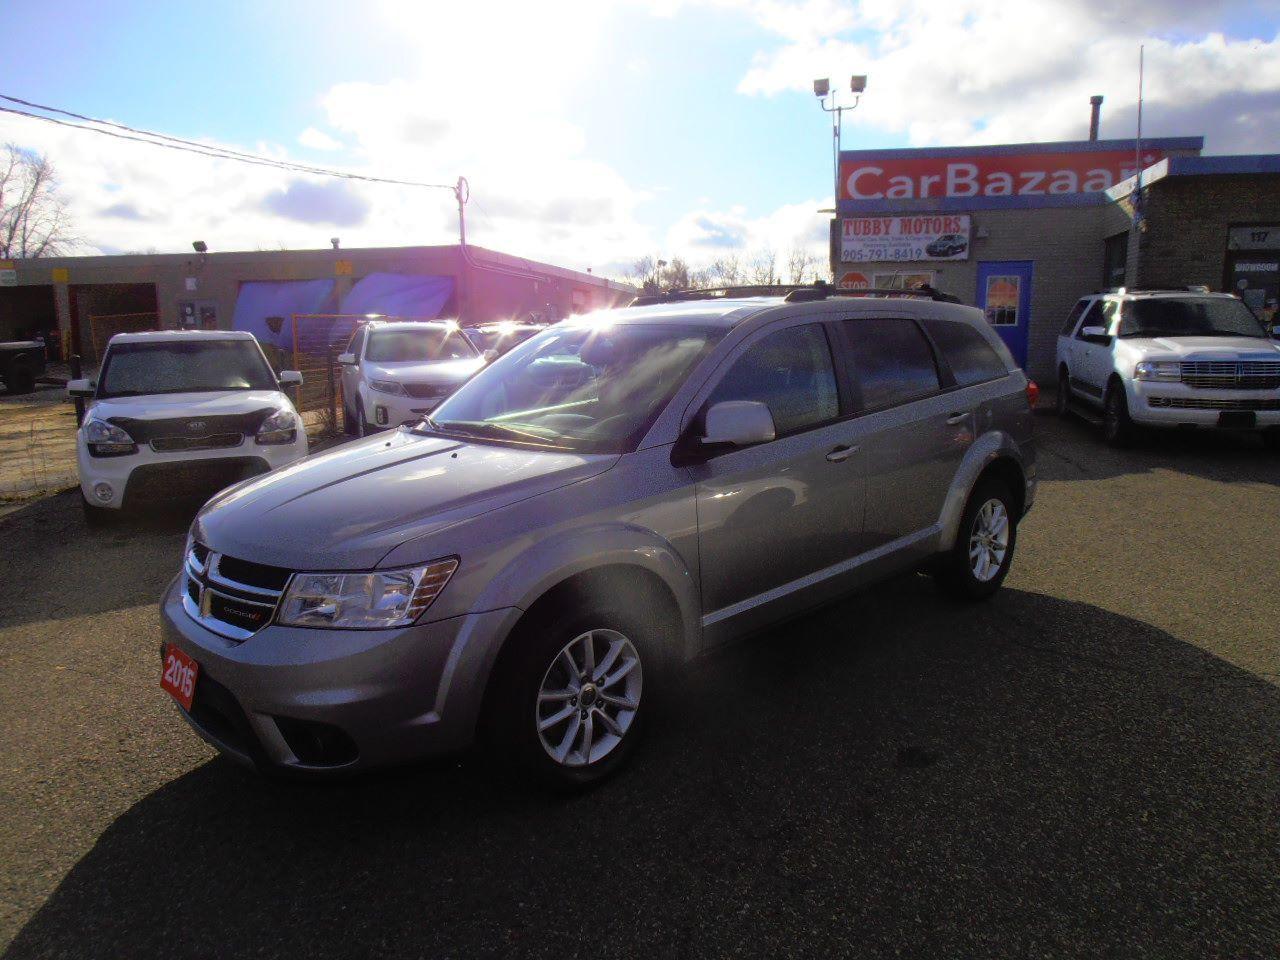 cars in ontario journey dodge used sxt brampton sale passanger for